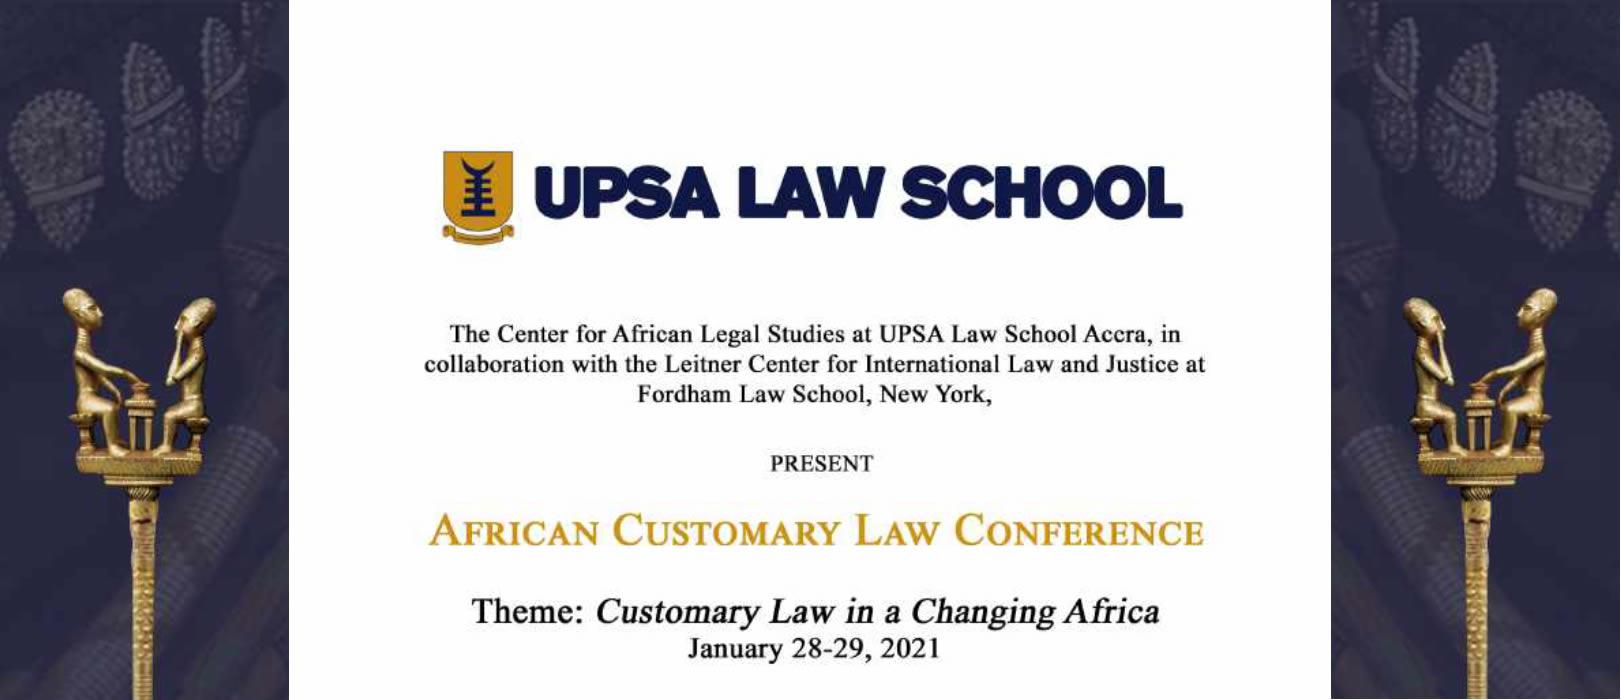 UPSA Law School